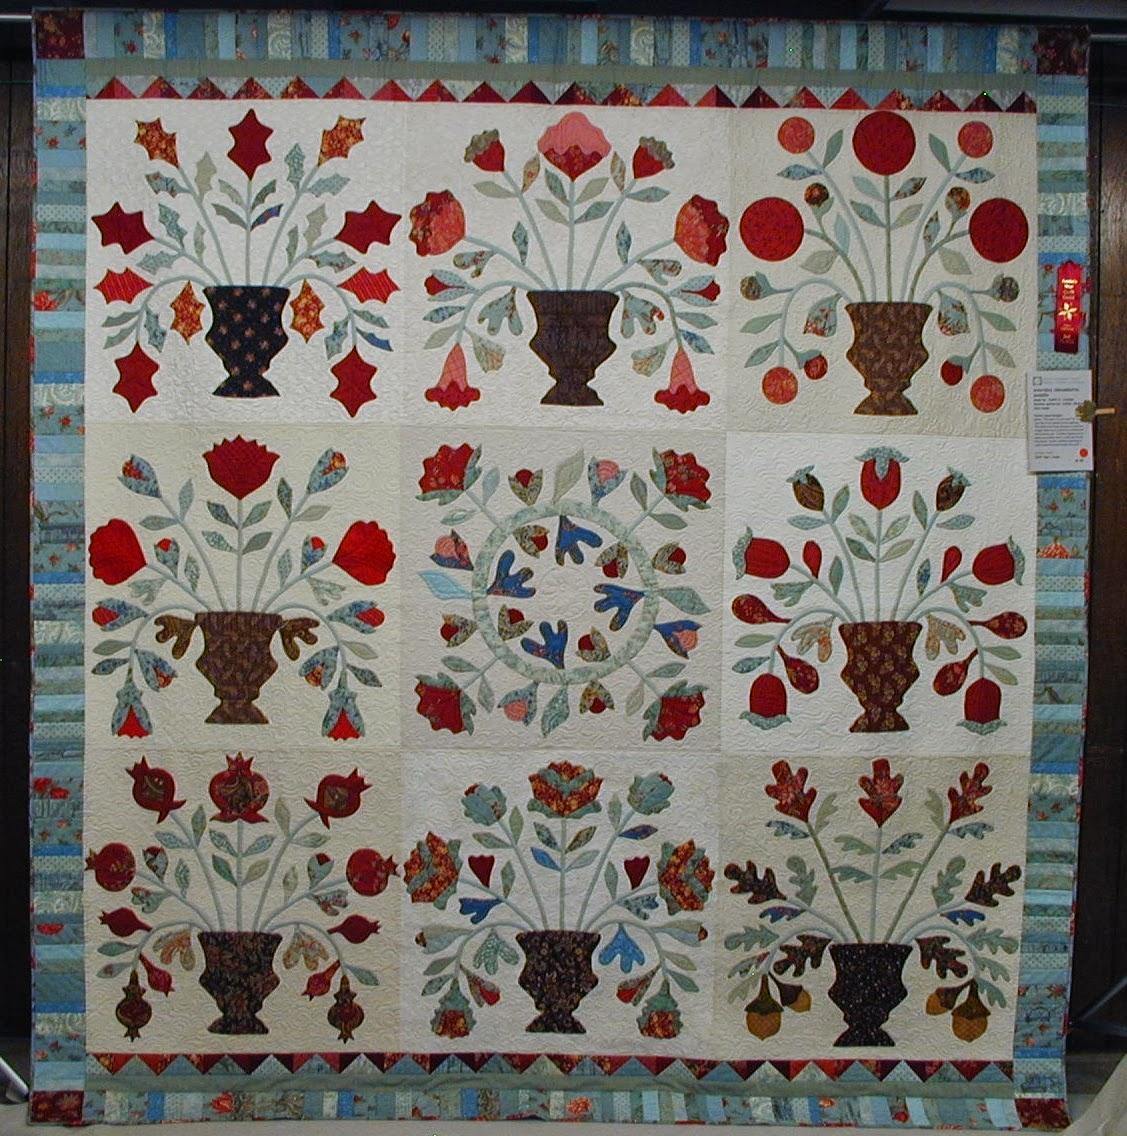 Amazing Quilts: Moonbear Longarm Quilting: ASQG Quilt Show